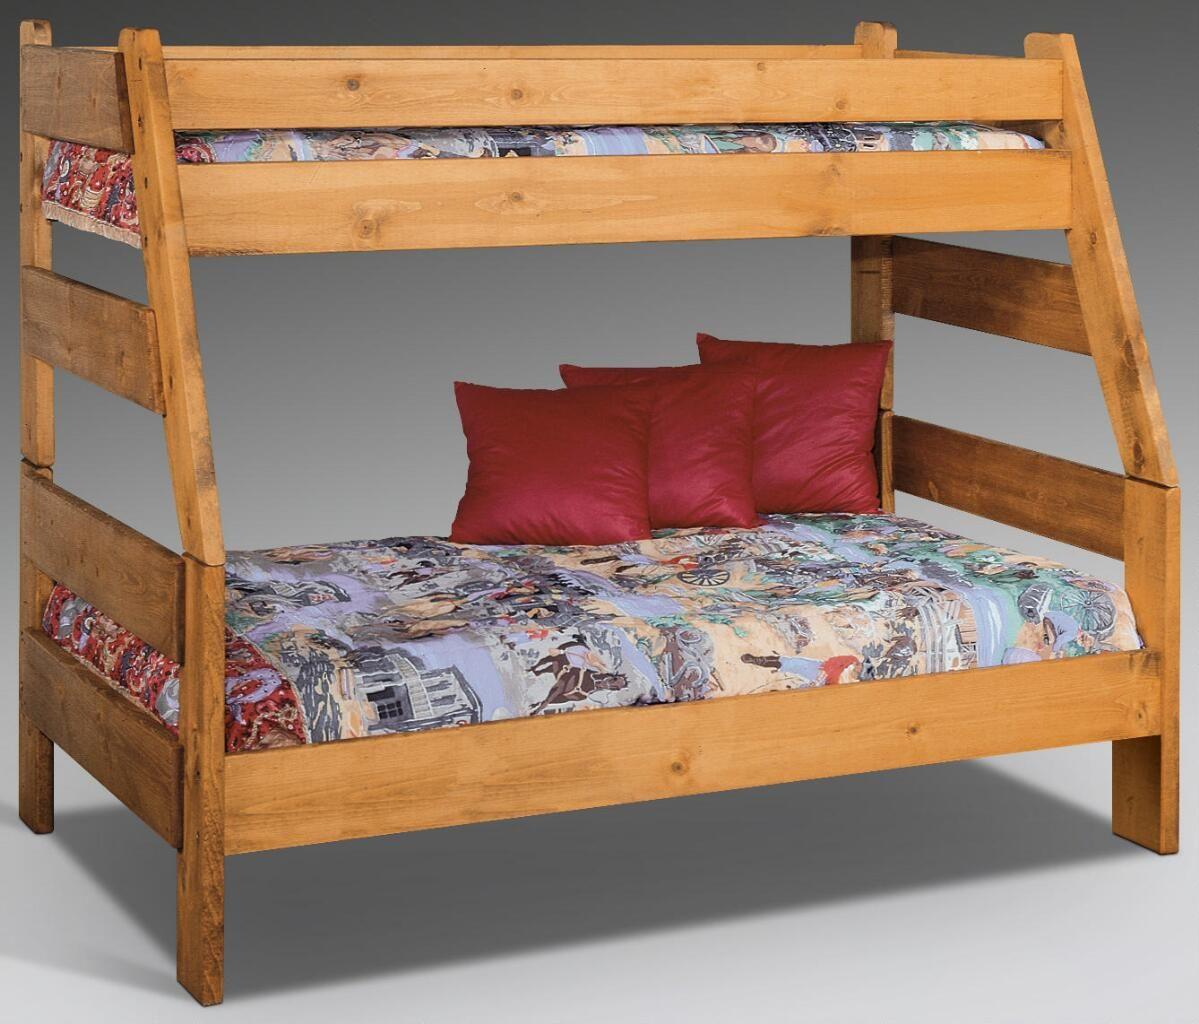 Sundance Twin Full Bunk Bed Childrens Bedroom Furniture Bunk Bed Designs